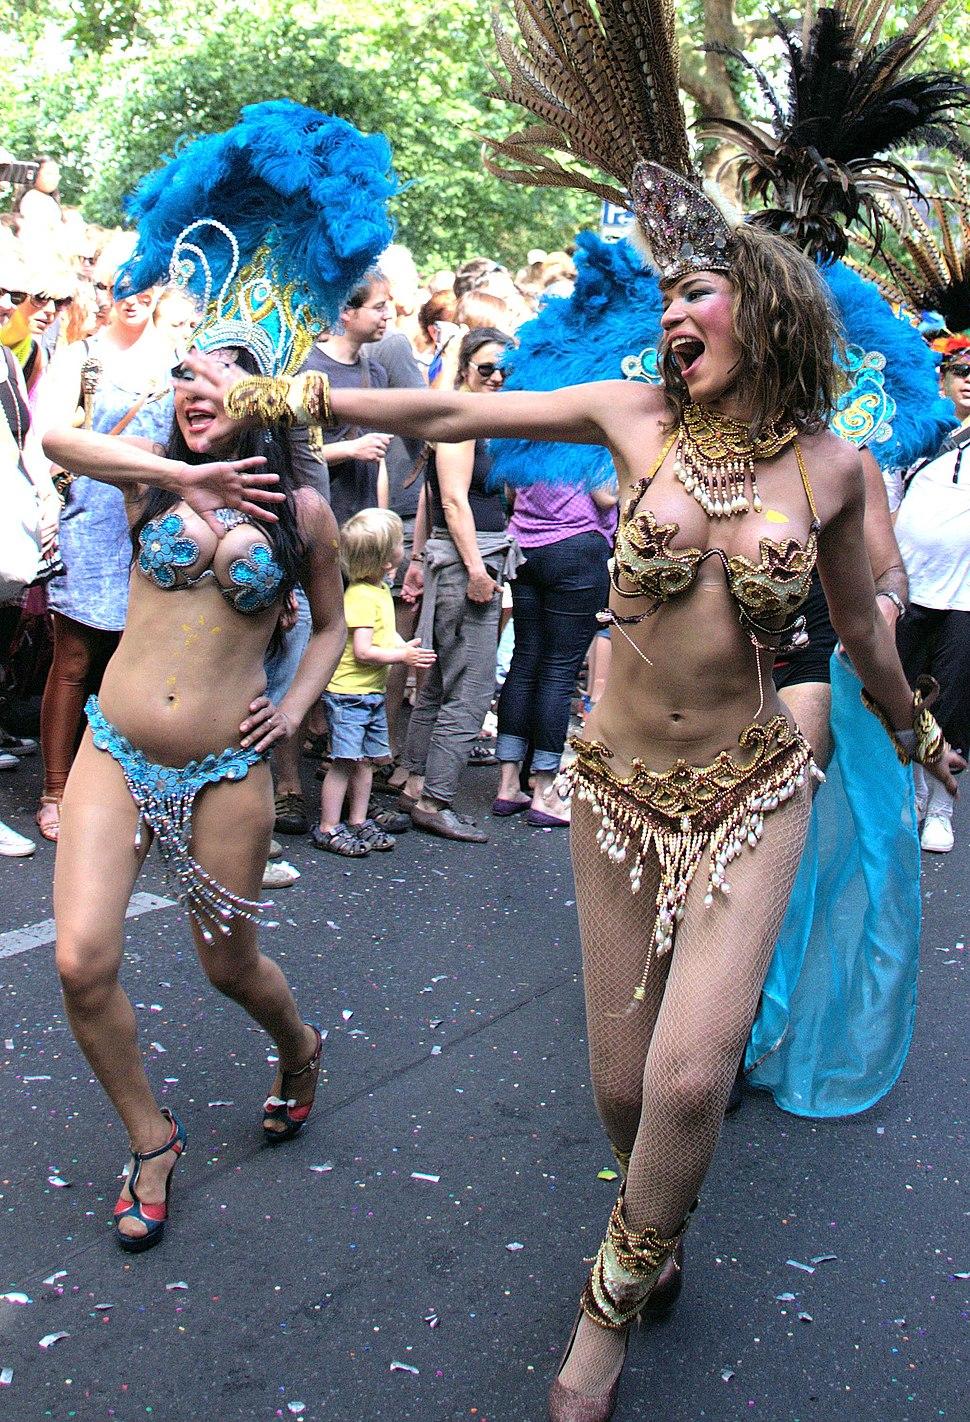 KarnevalderKulturenBerlin2012